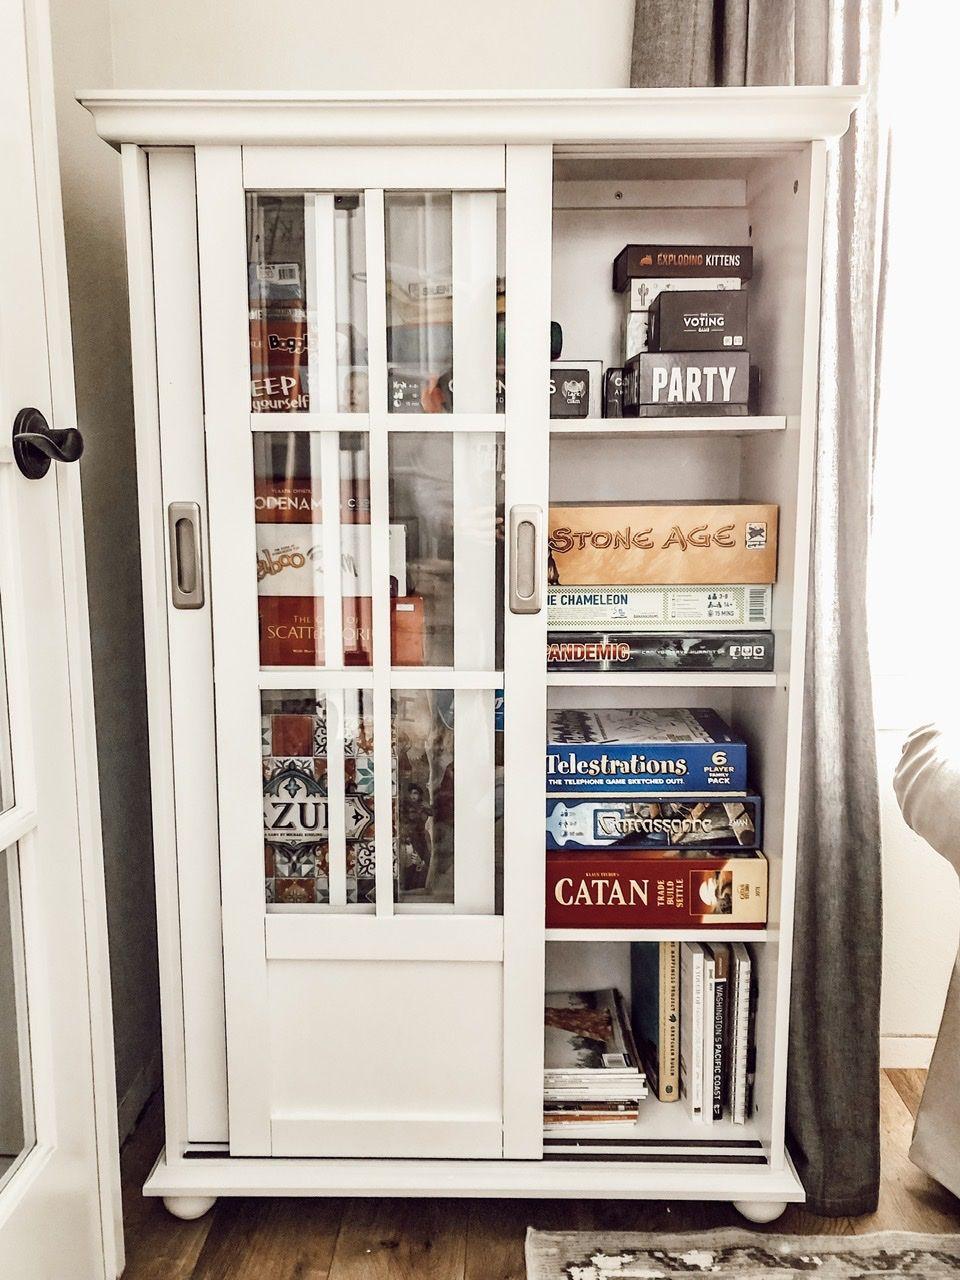 Organizing Board Games Using Small Storage Cabinets With Wayfair Com In 2020 Small Storage Cabinet Storage Cabinets Board Game Storage